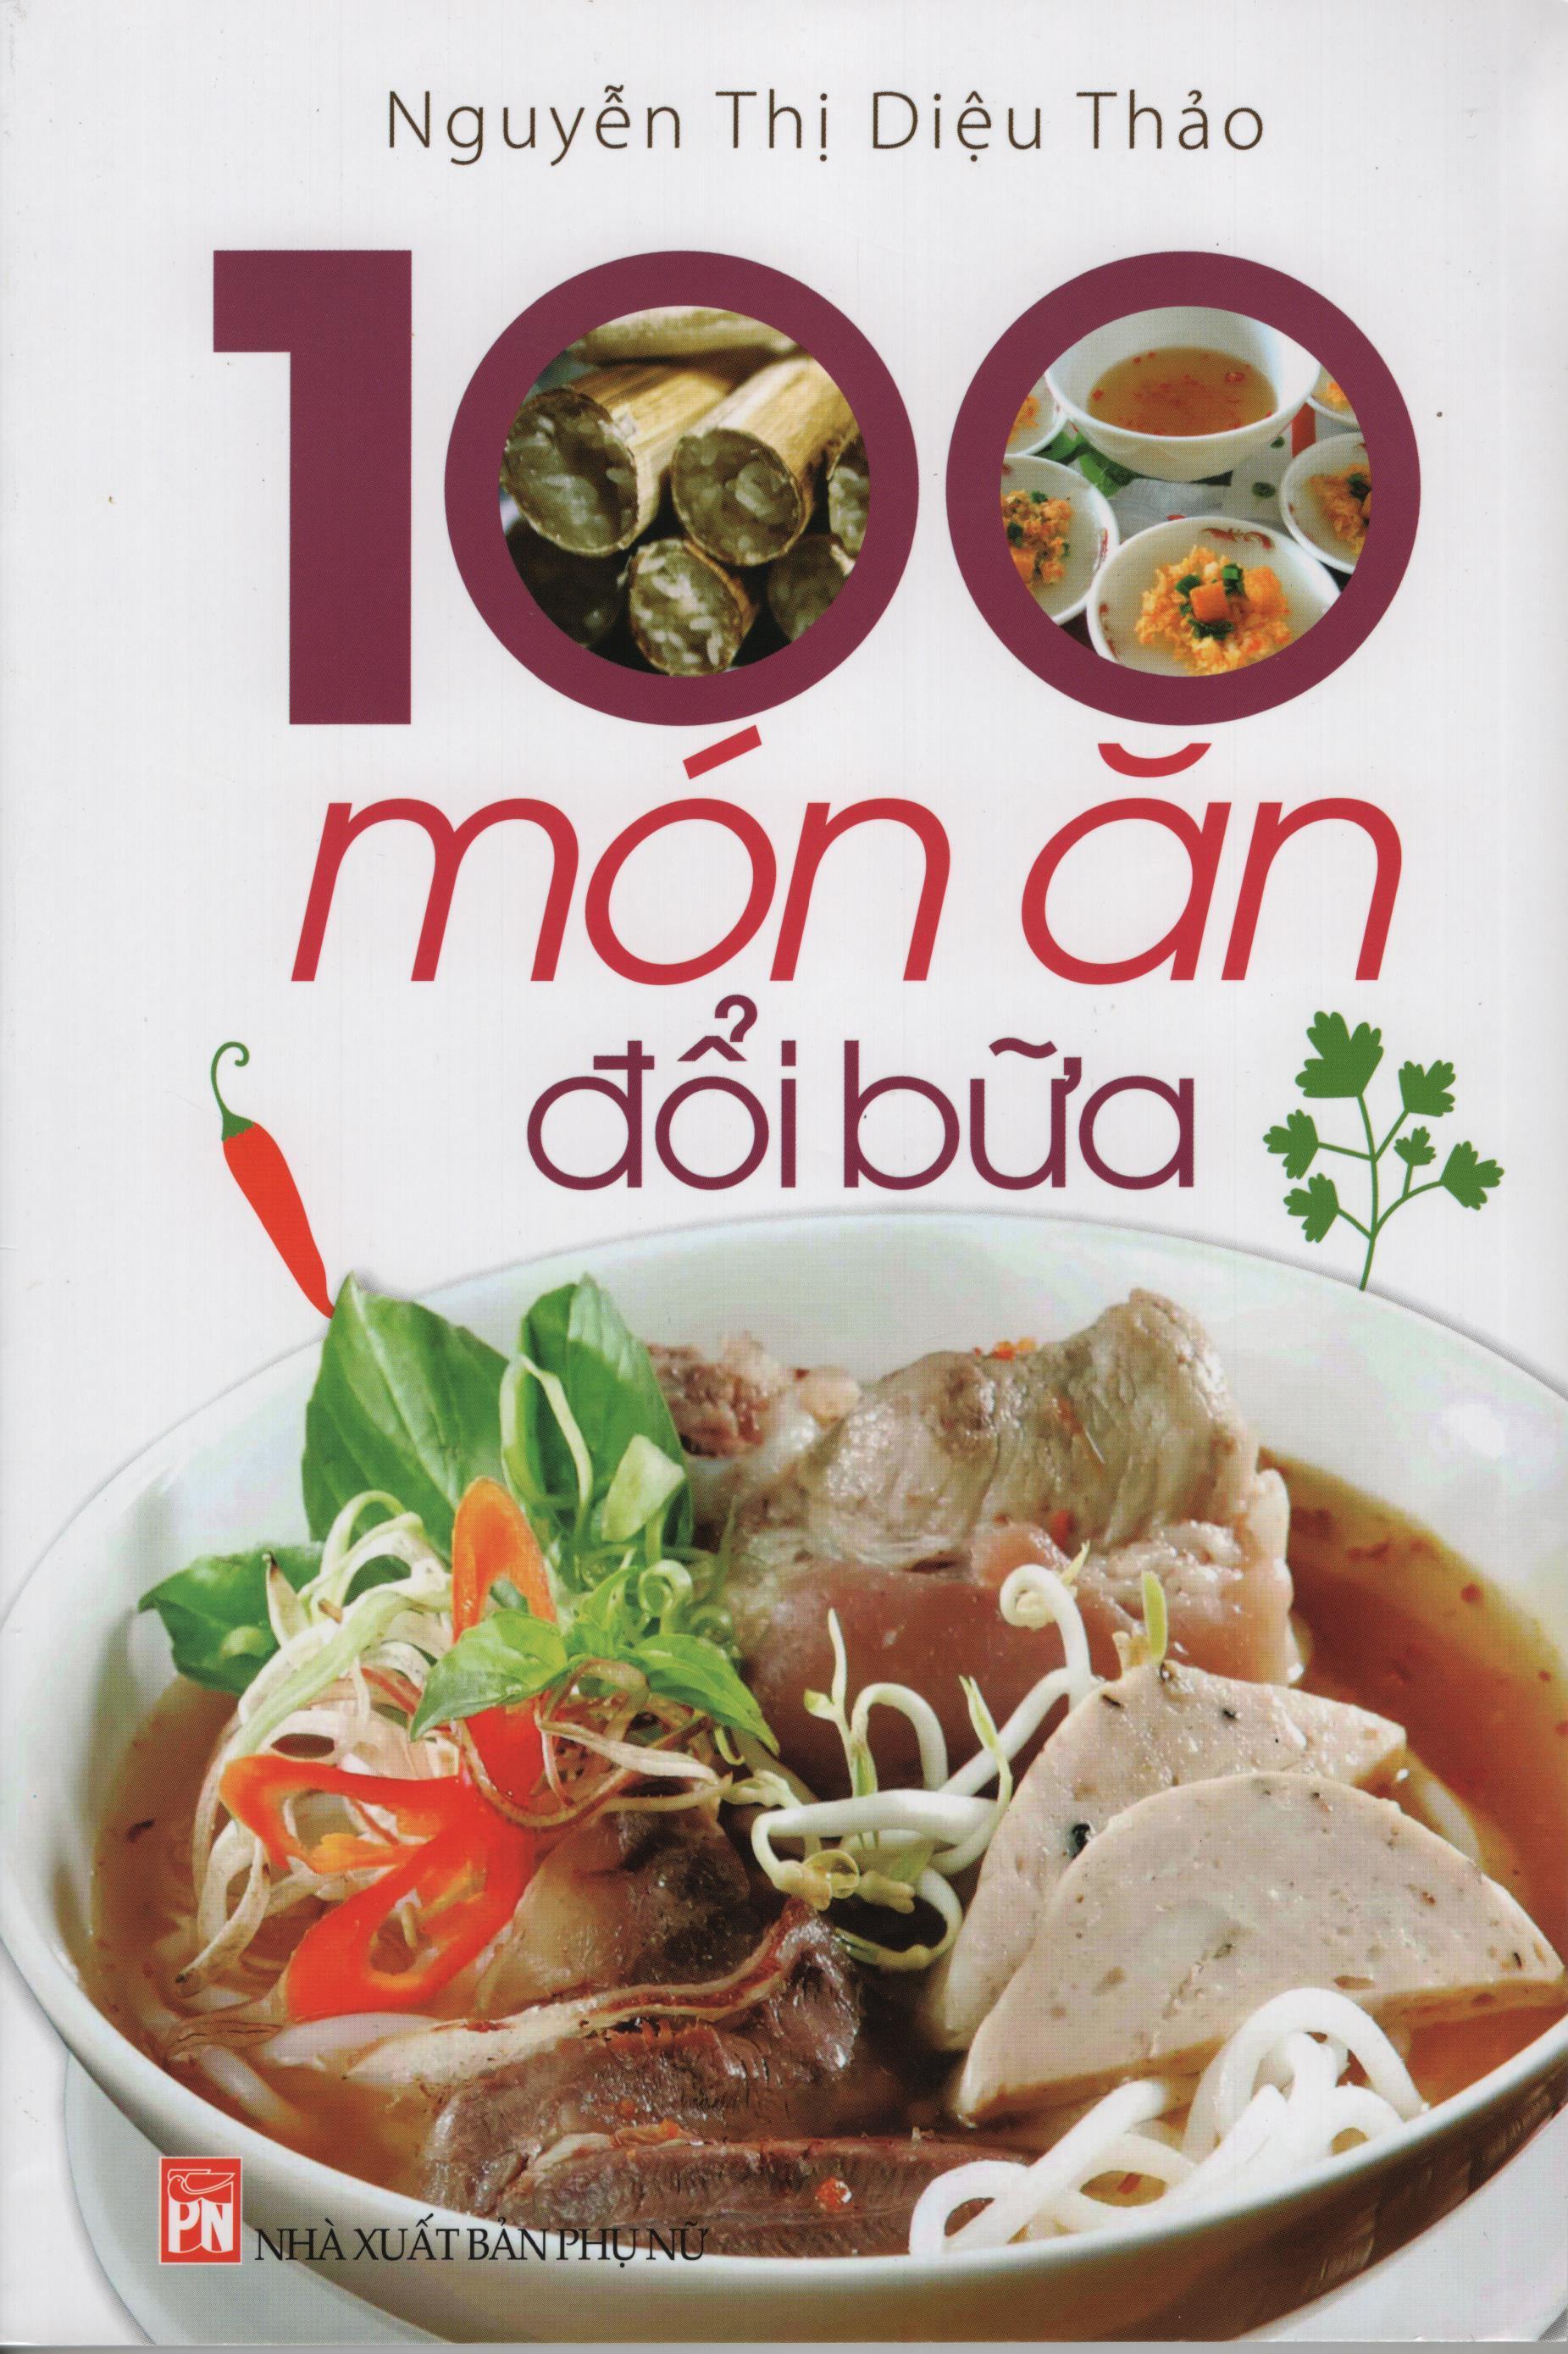 100 Món Ăn Đổi Bữa (Tái Bản)